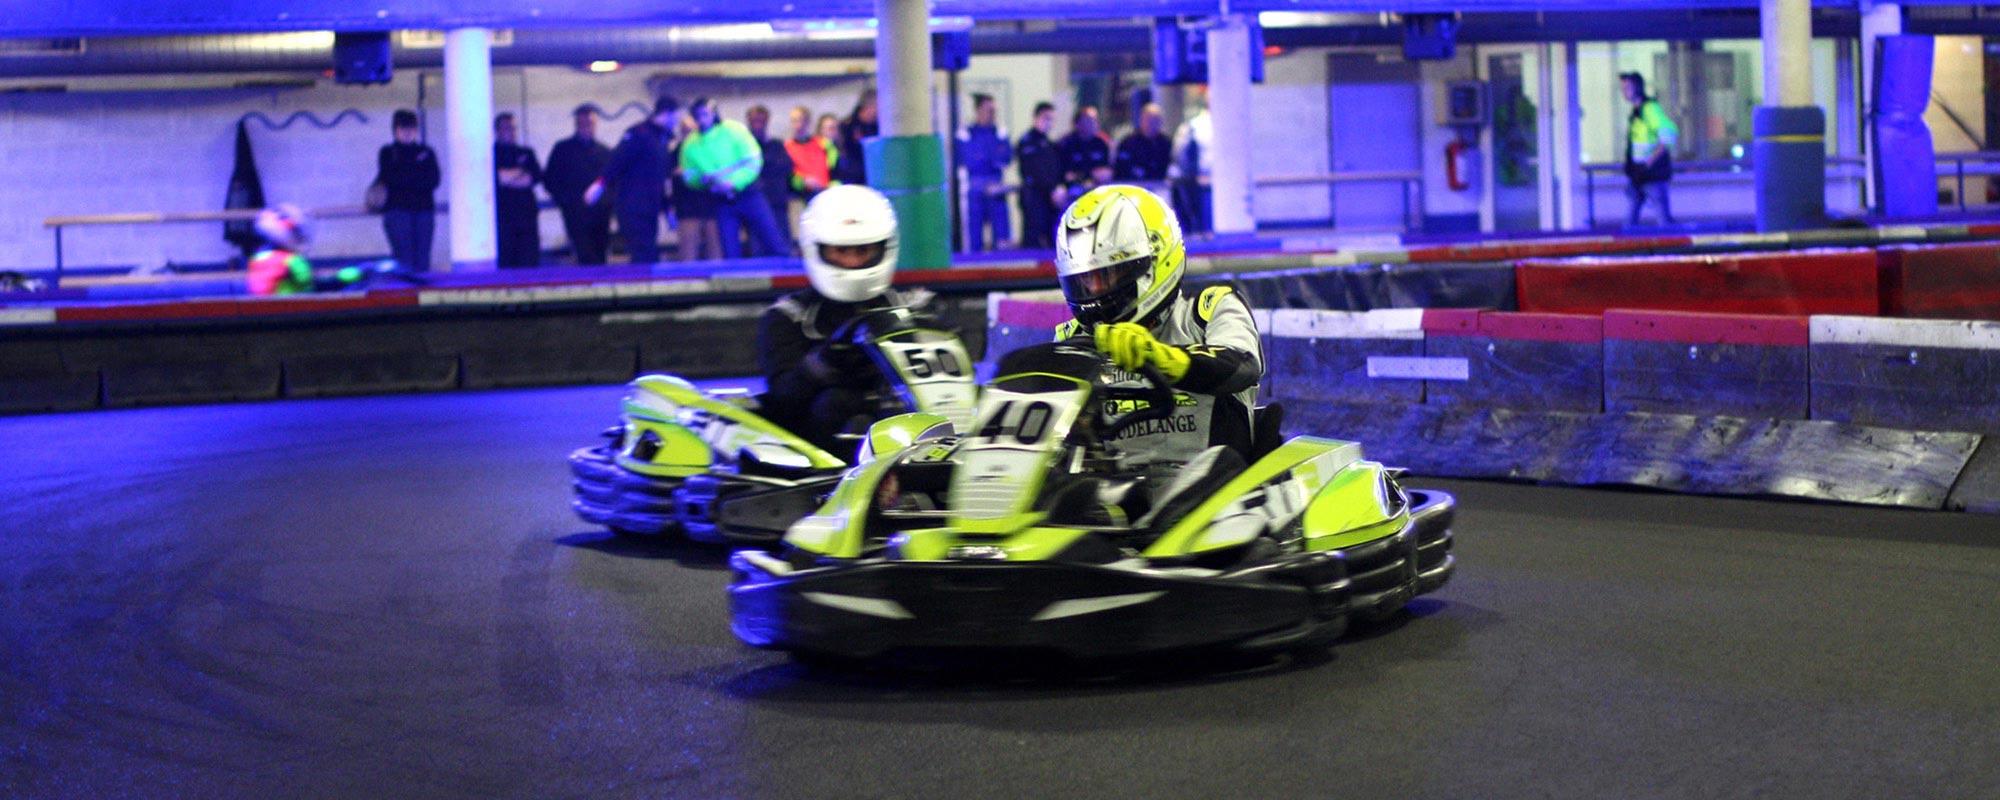 ebafkc-karting-2000x800-08